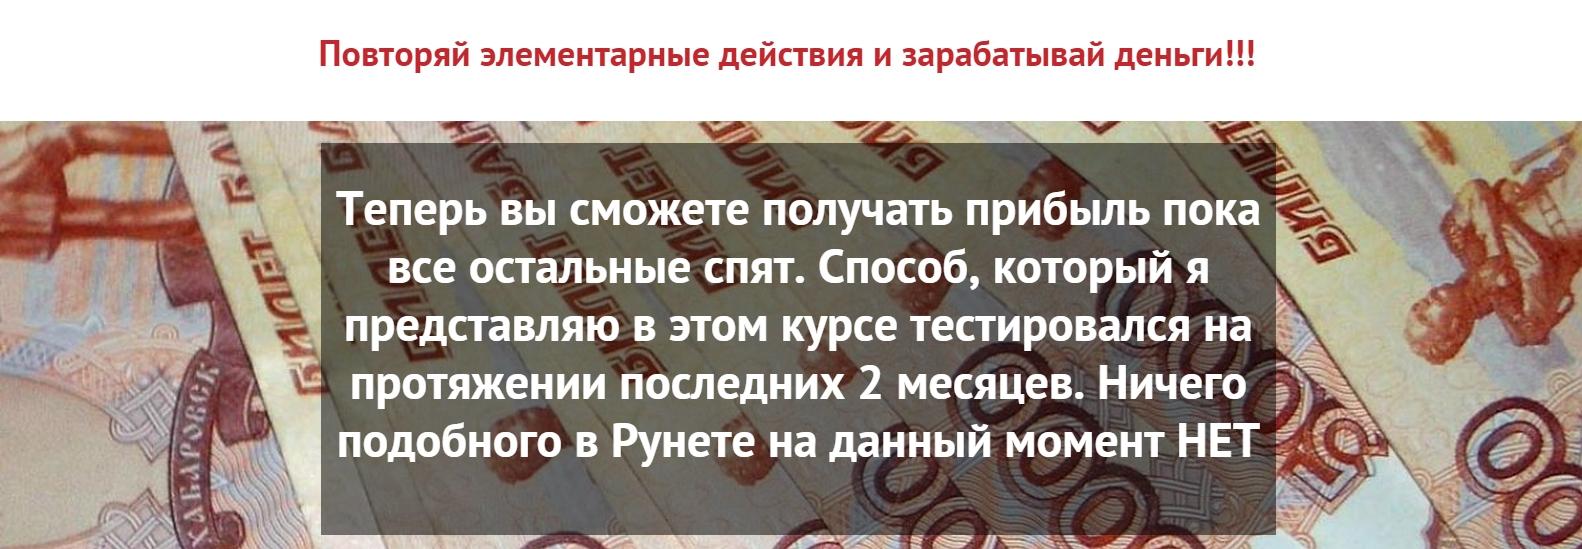 http://media.lpgenerator.ru/images/231192/aa09ba5007cc1b1d57739d55e5ea5888.jpg#size_1582x549